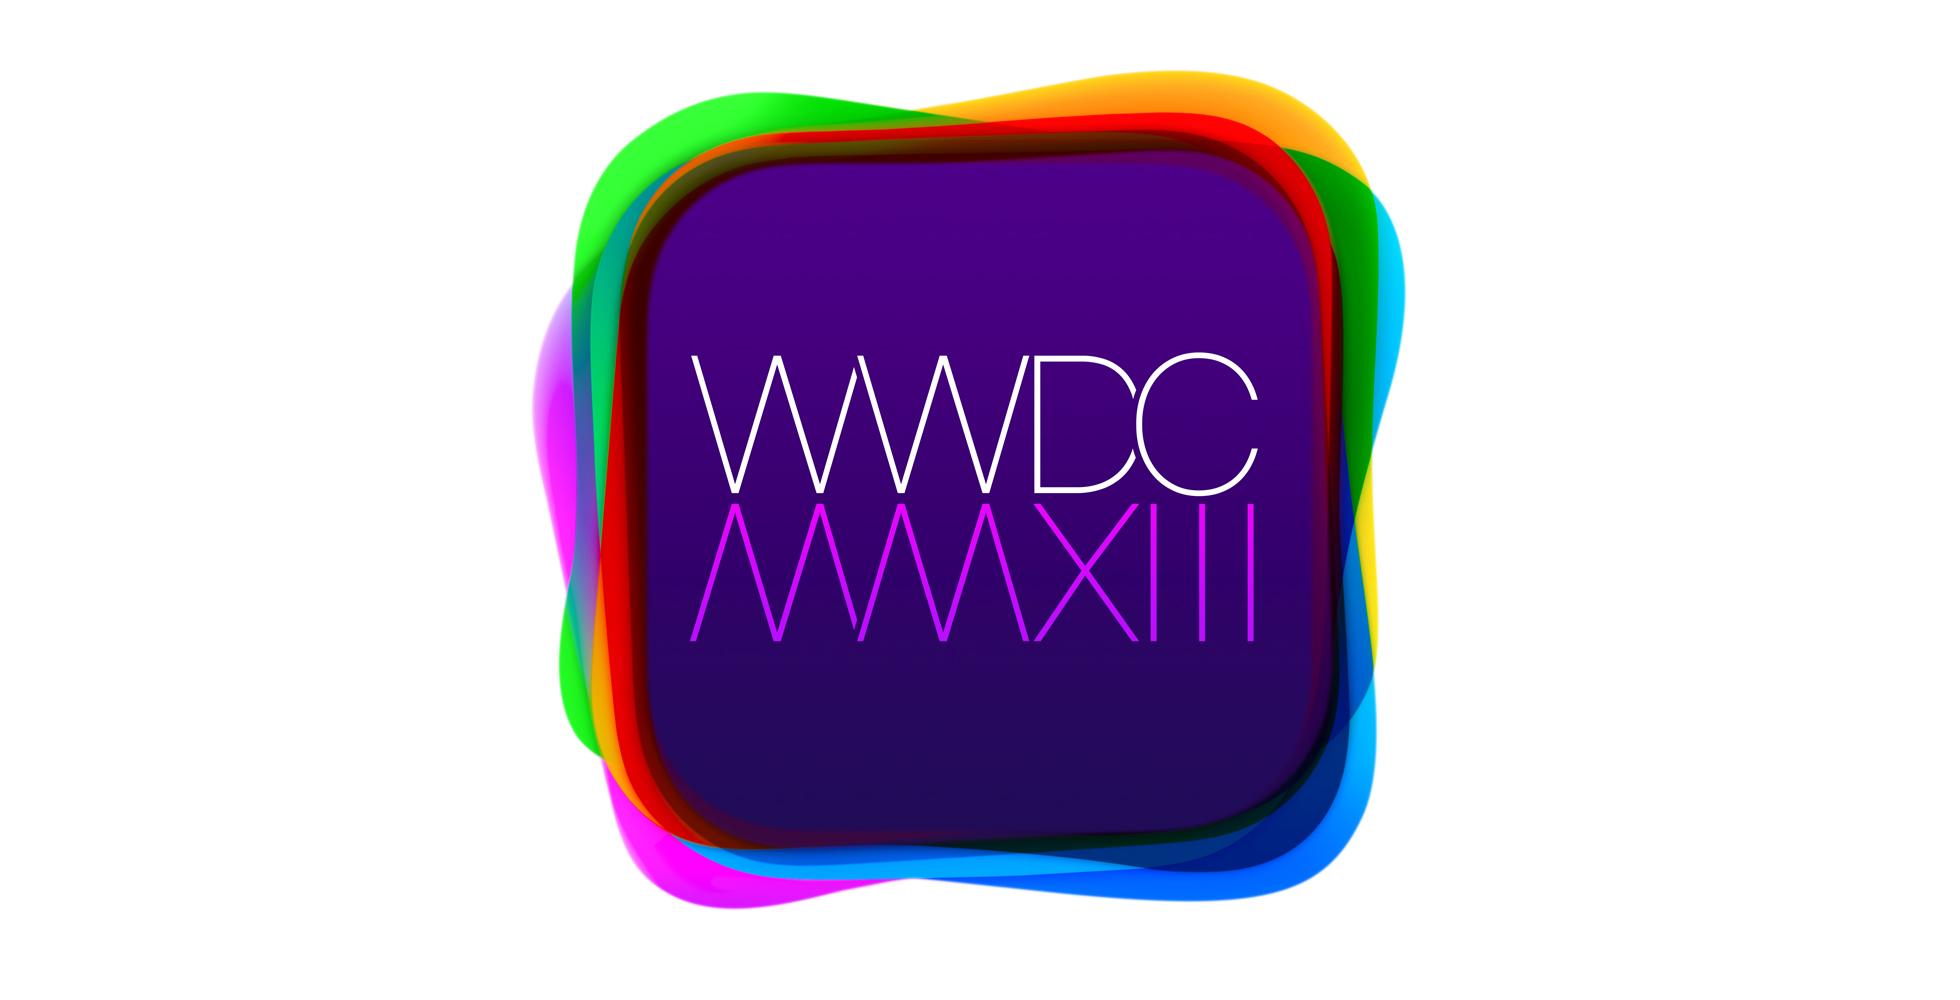 Liveblog: Apple's WWDC 2013 keynote | Ars Technica